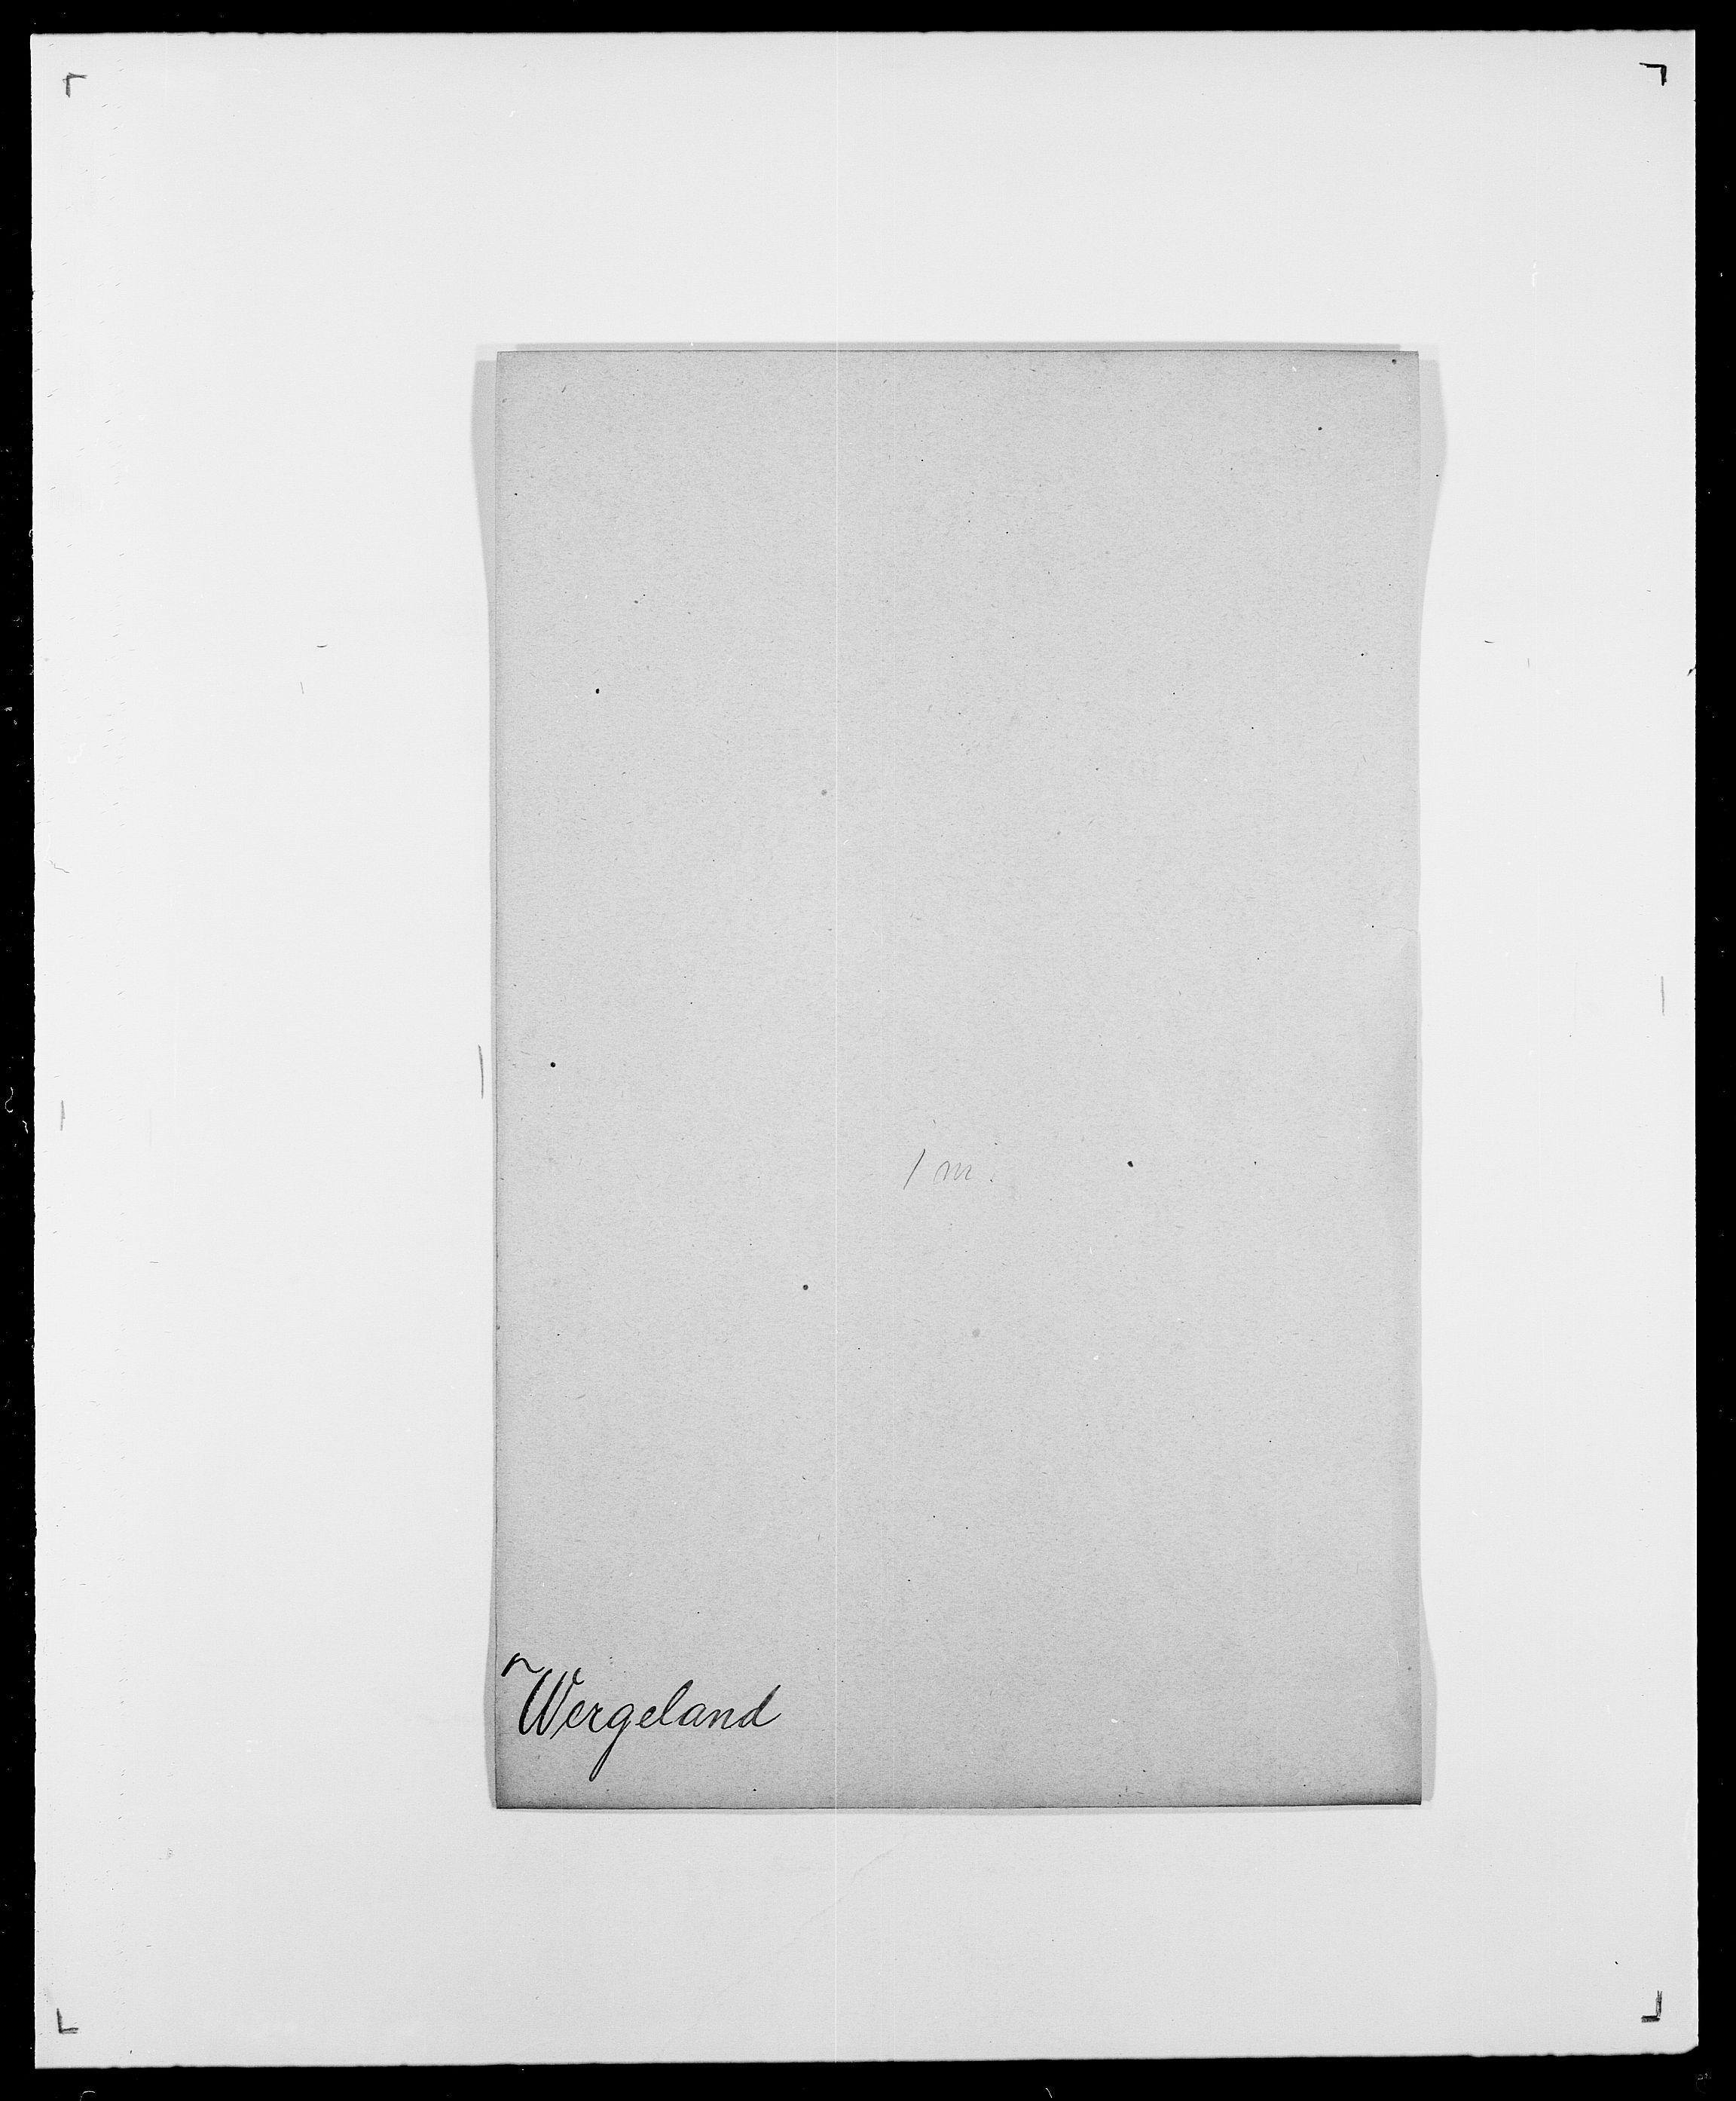 SAO, Delgobe, Charles Antoine - samling, D/Da/L0041: Vemmestad - Viker, s. 102